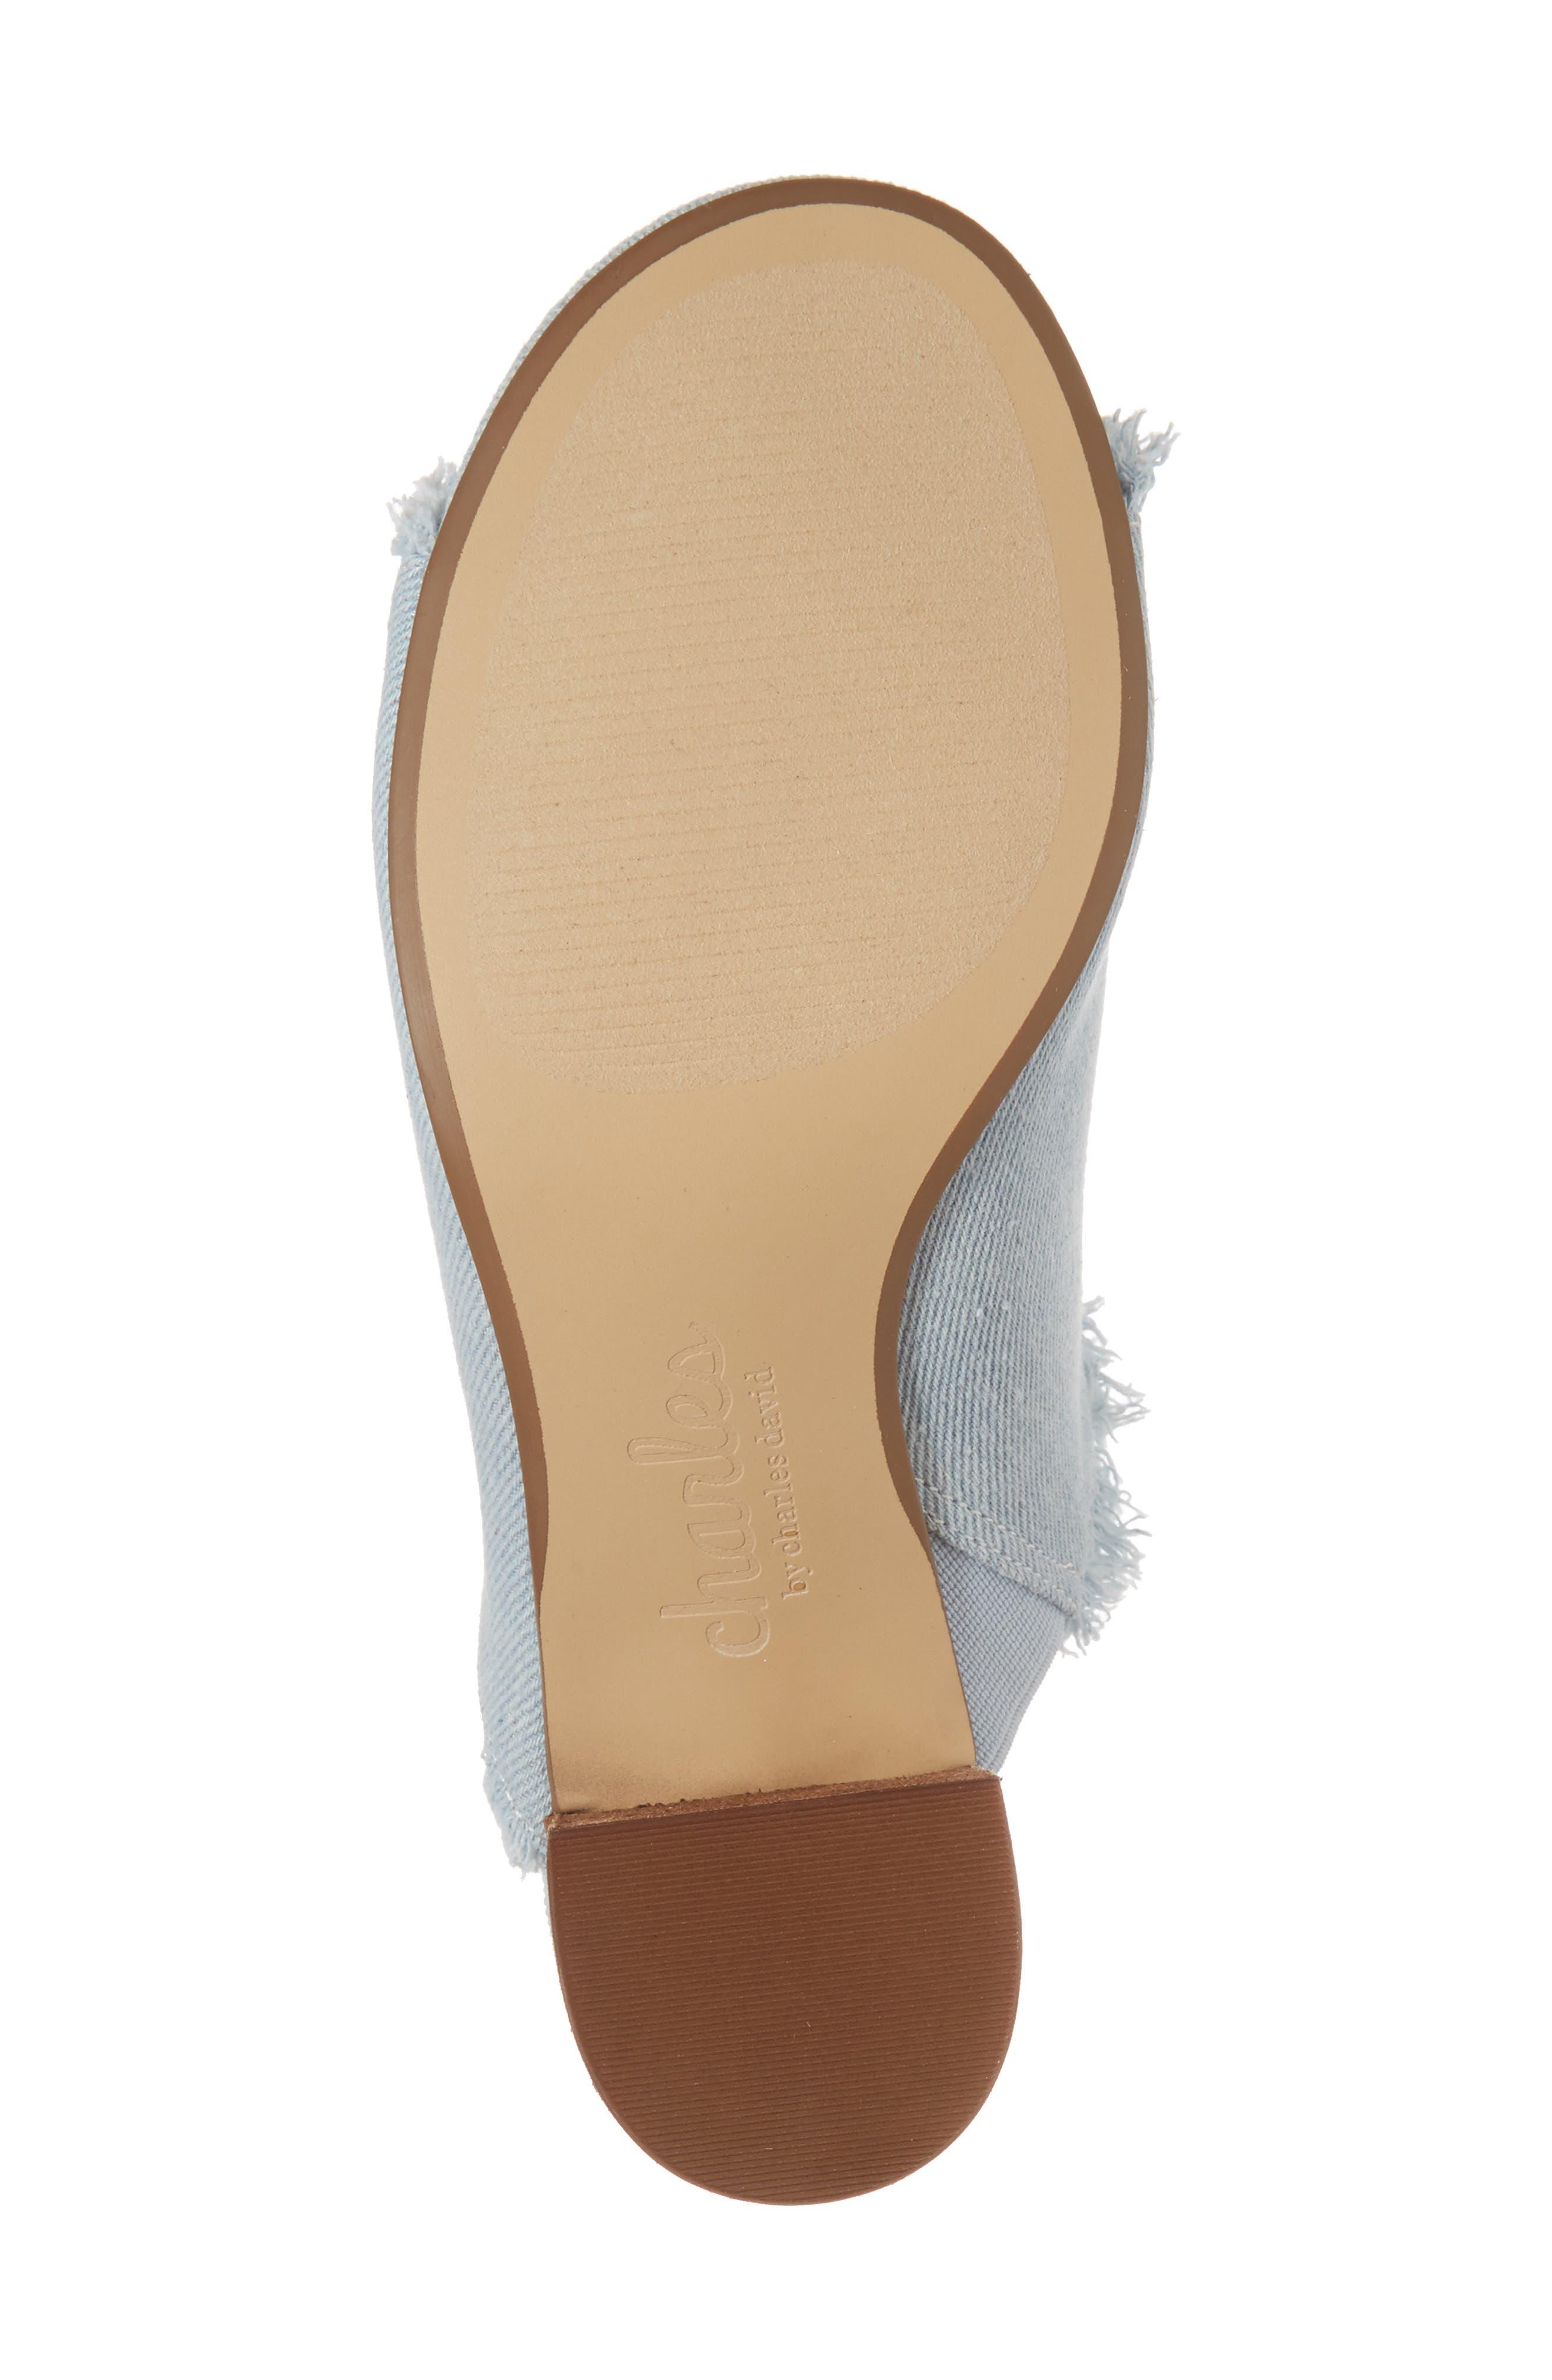 Kadia Fringed Mule Sandal,                             Alternate thumbnail 18, color,